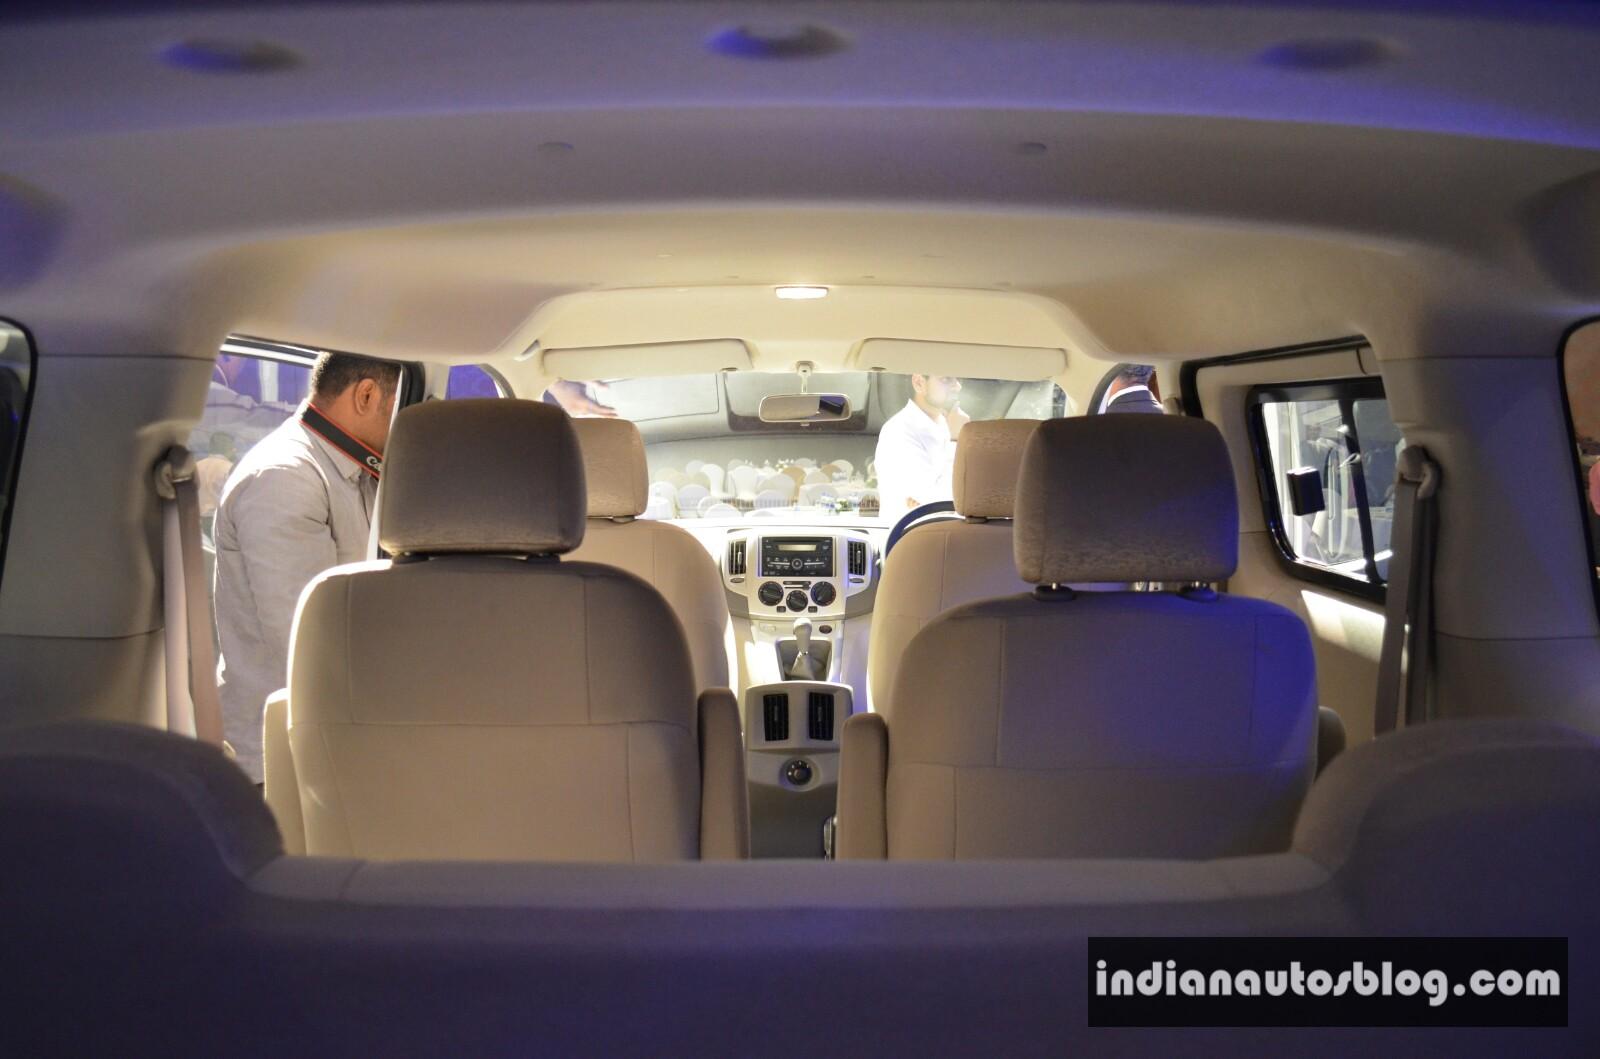 Ashok Leyland Stile three row seating